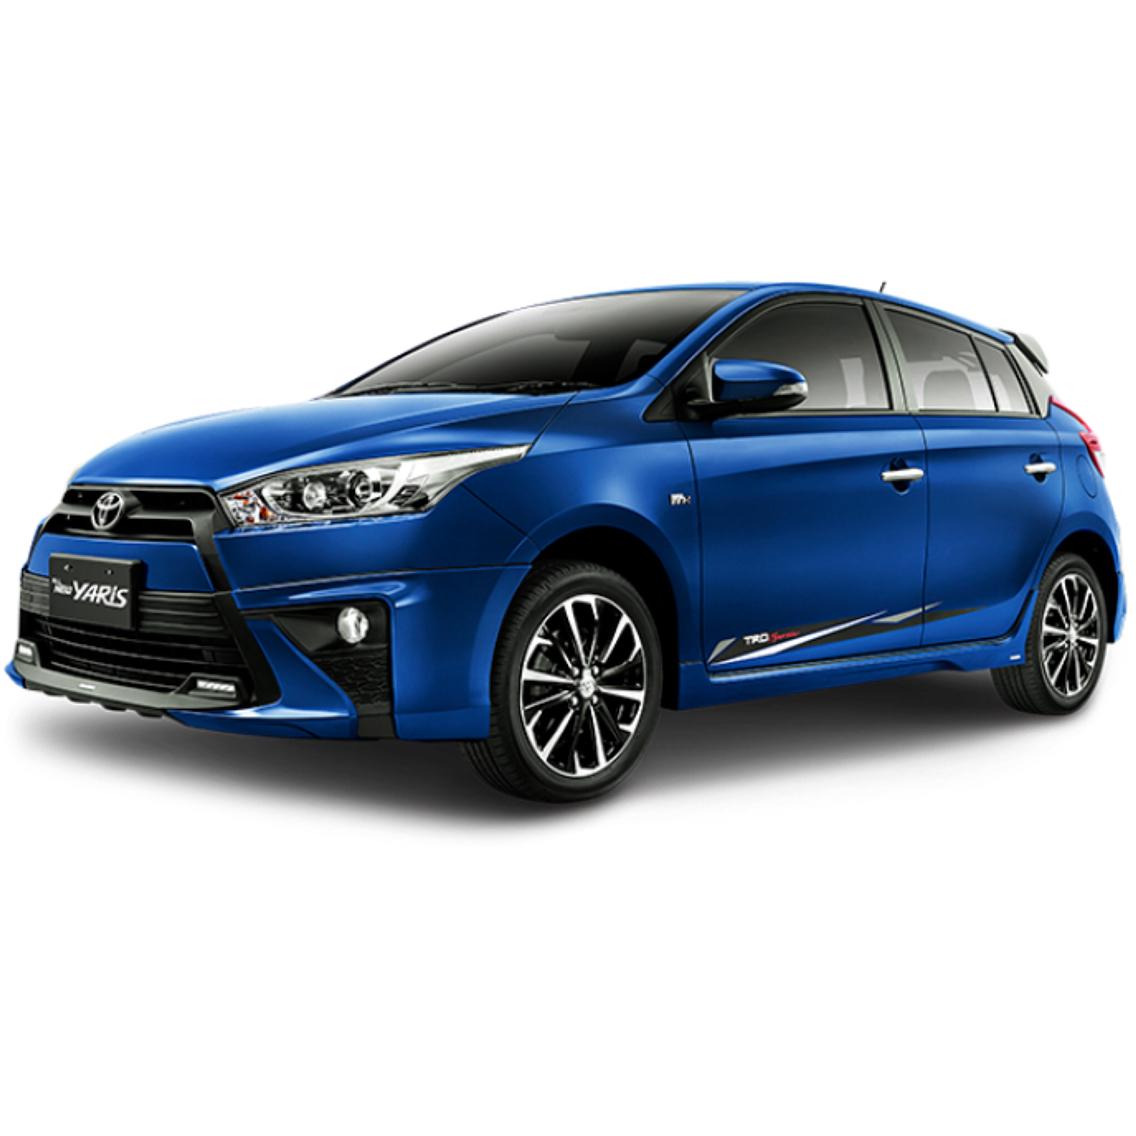 Harga Toyota Yaris Trd Matic New S Cvt Heykers Mobil Semarang Sales Promo Kredit